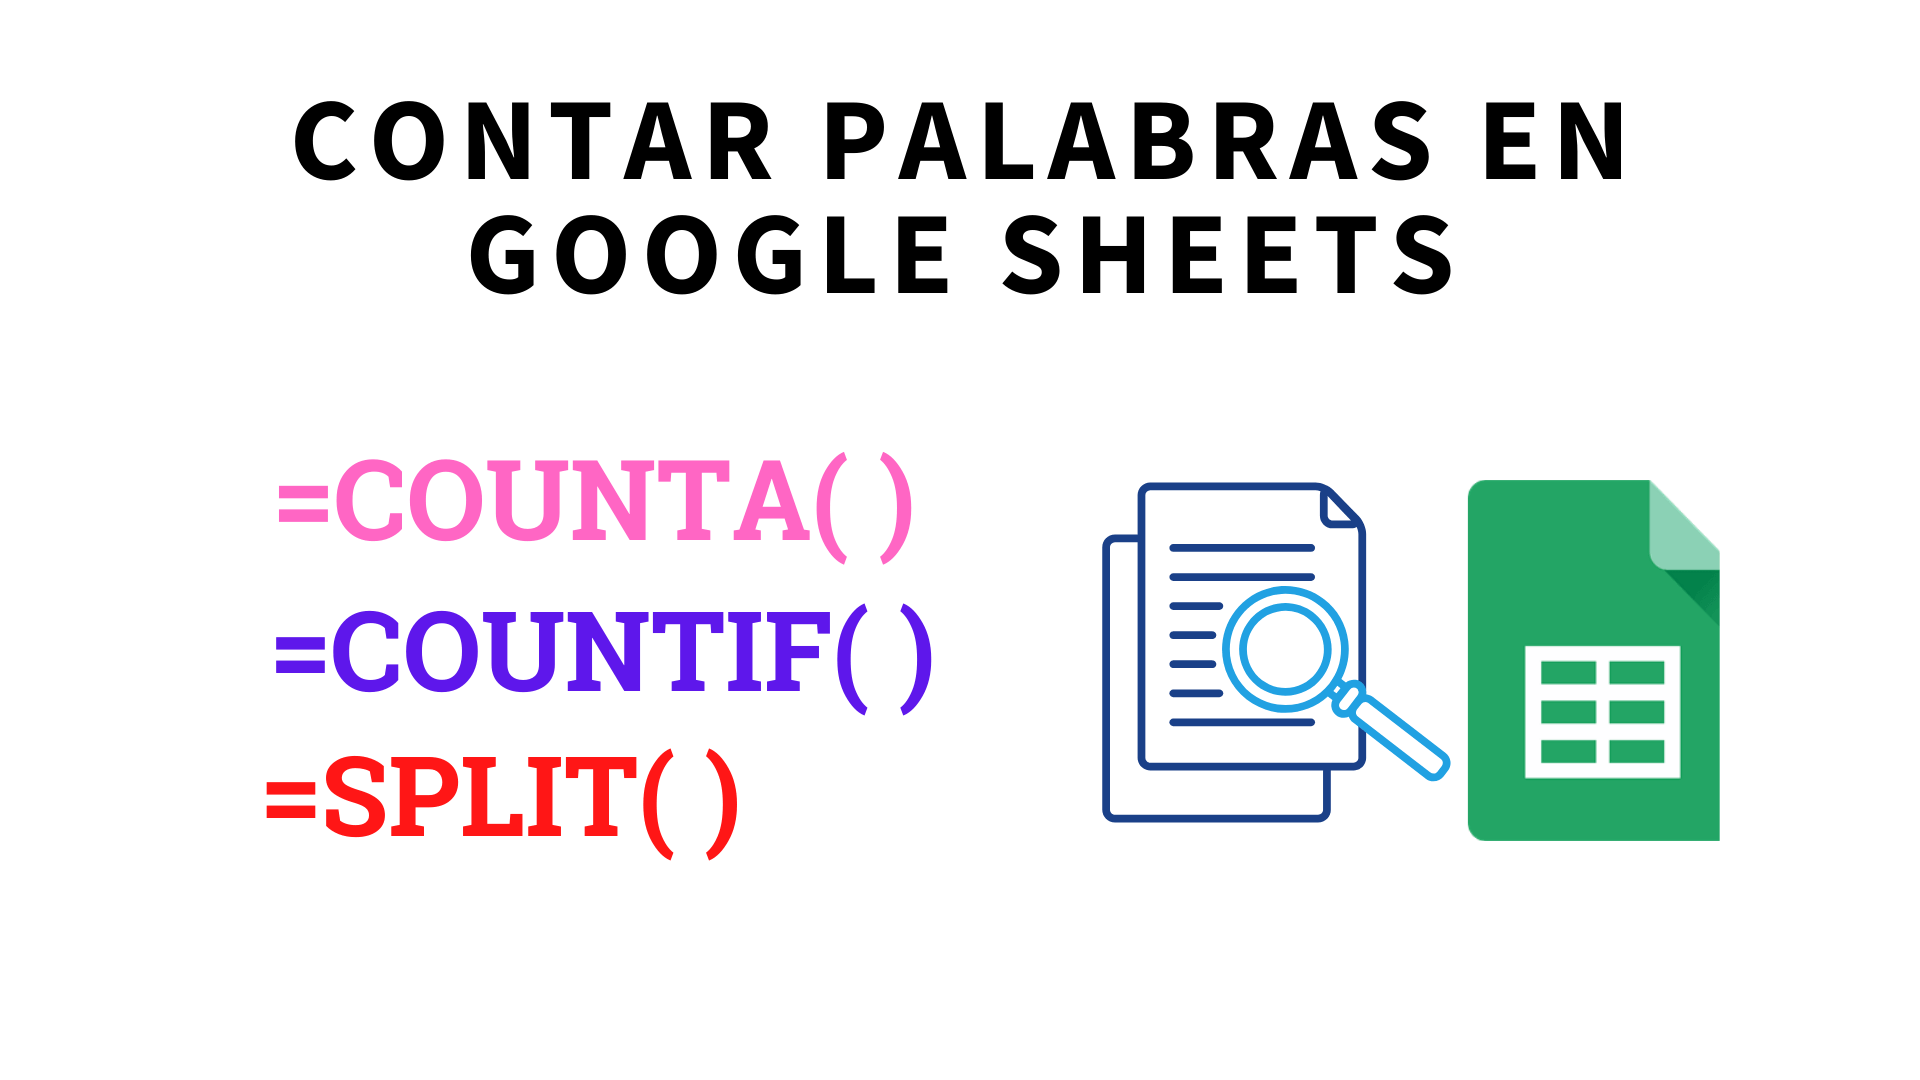 Contar palabras en Hojas de Cálculo de Google (Google Sheets)